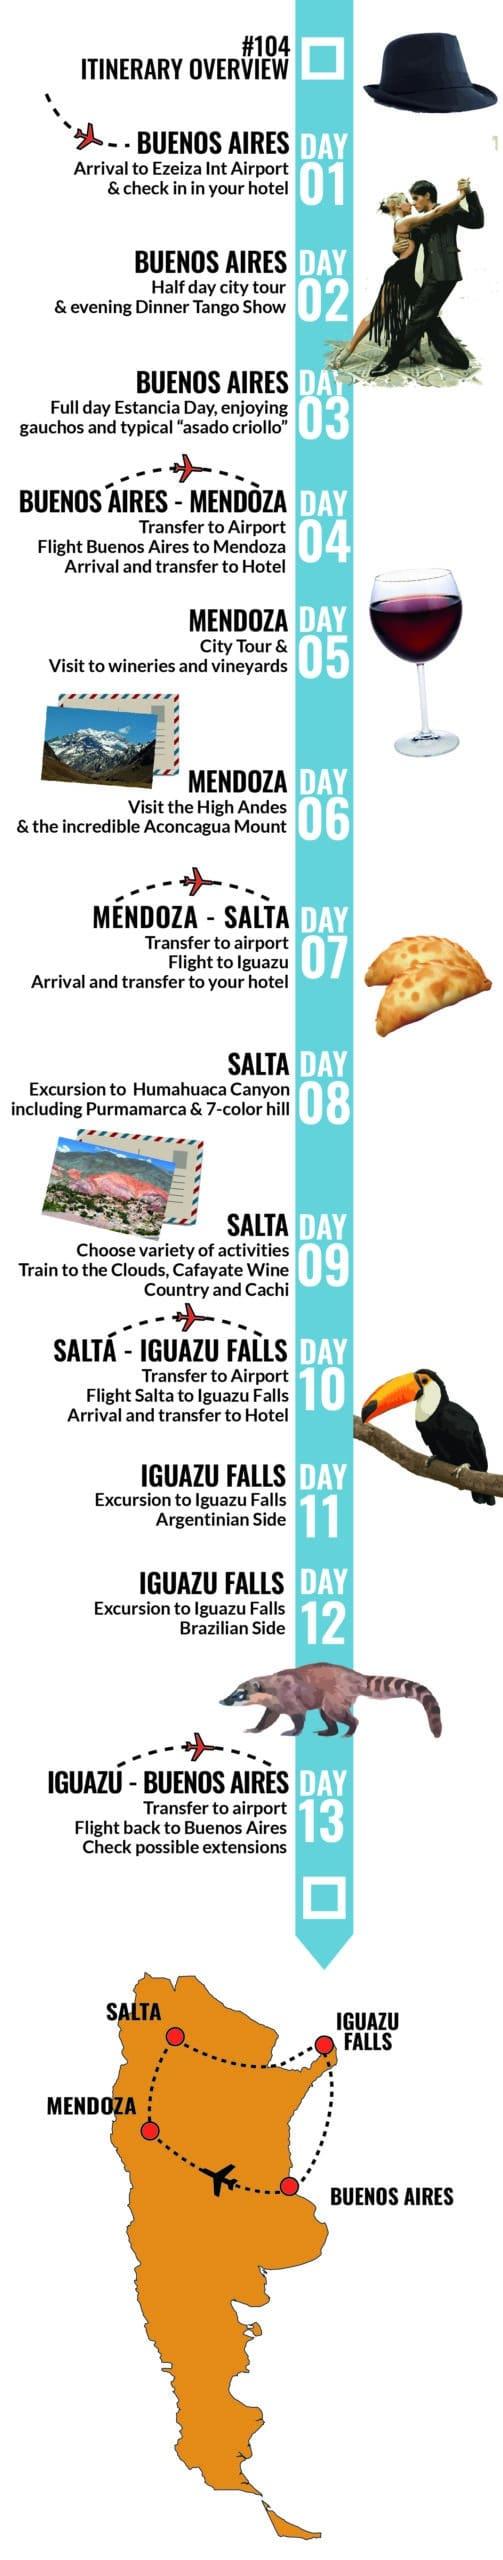 Buenos Aires, Mendoza, Salta and iguazu Falls, the Argentinian North by RipioTurismo Incoming Tour Operator Argentina